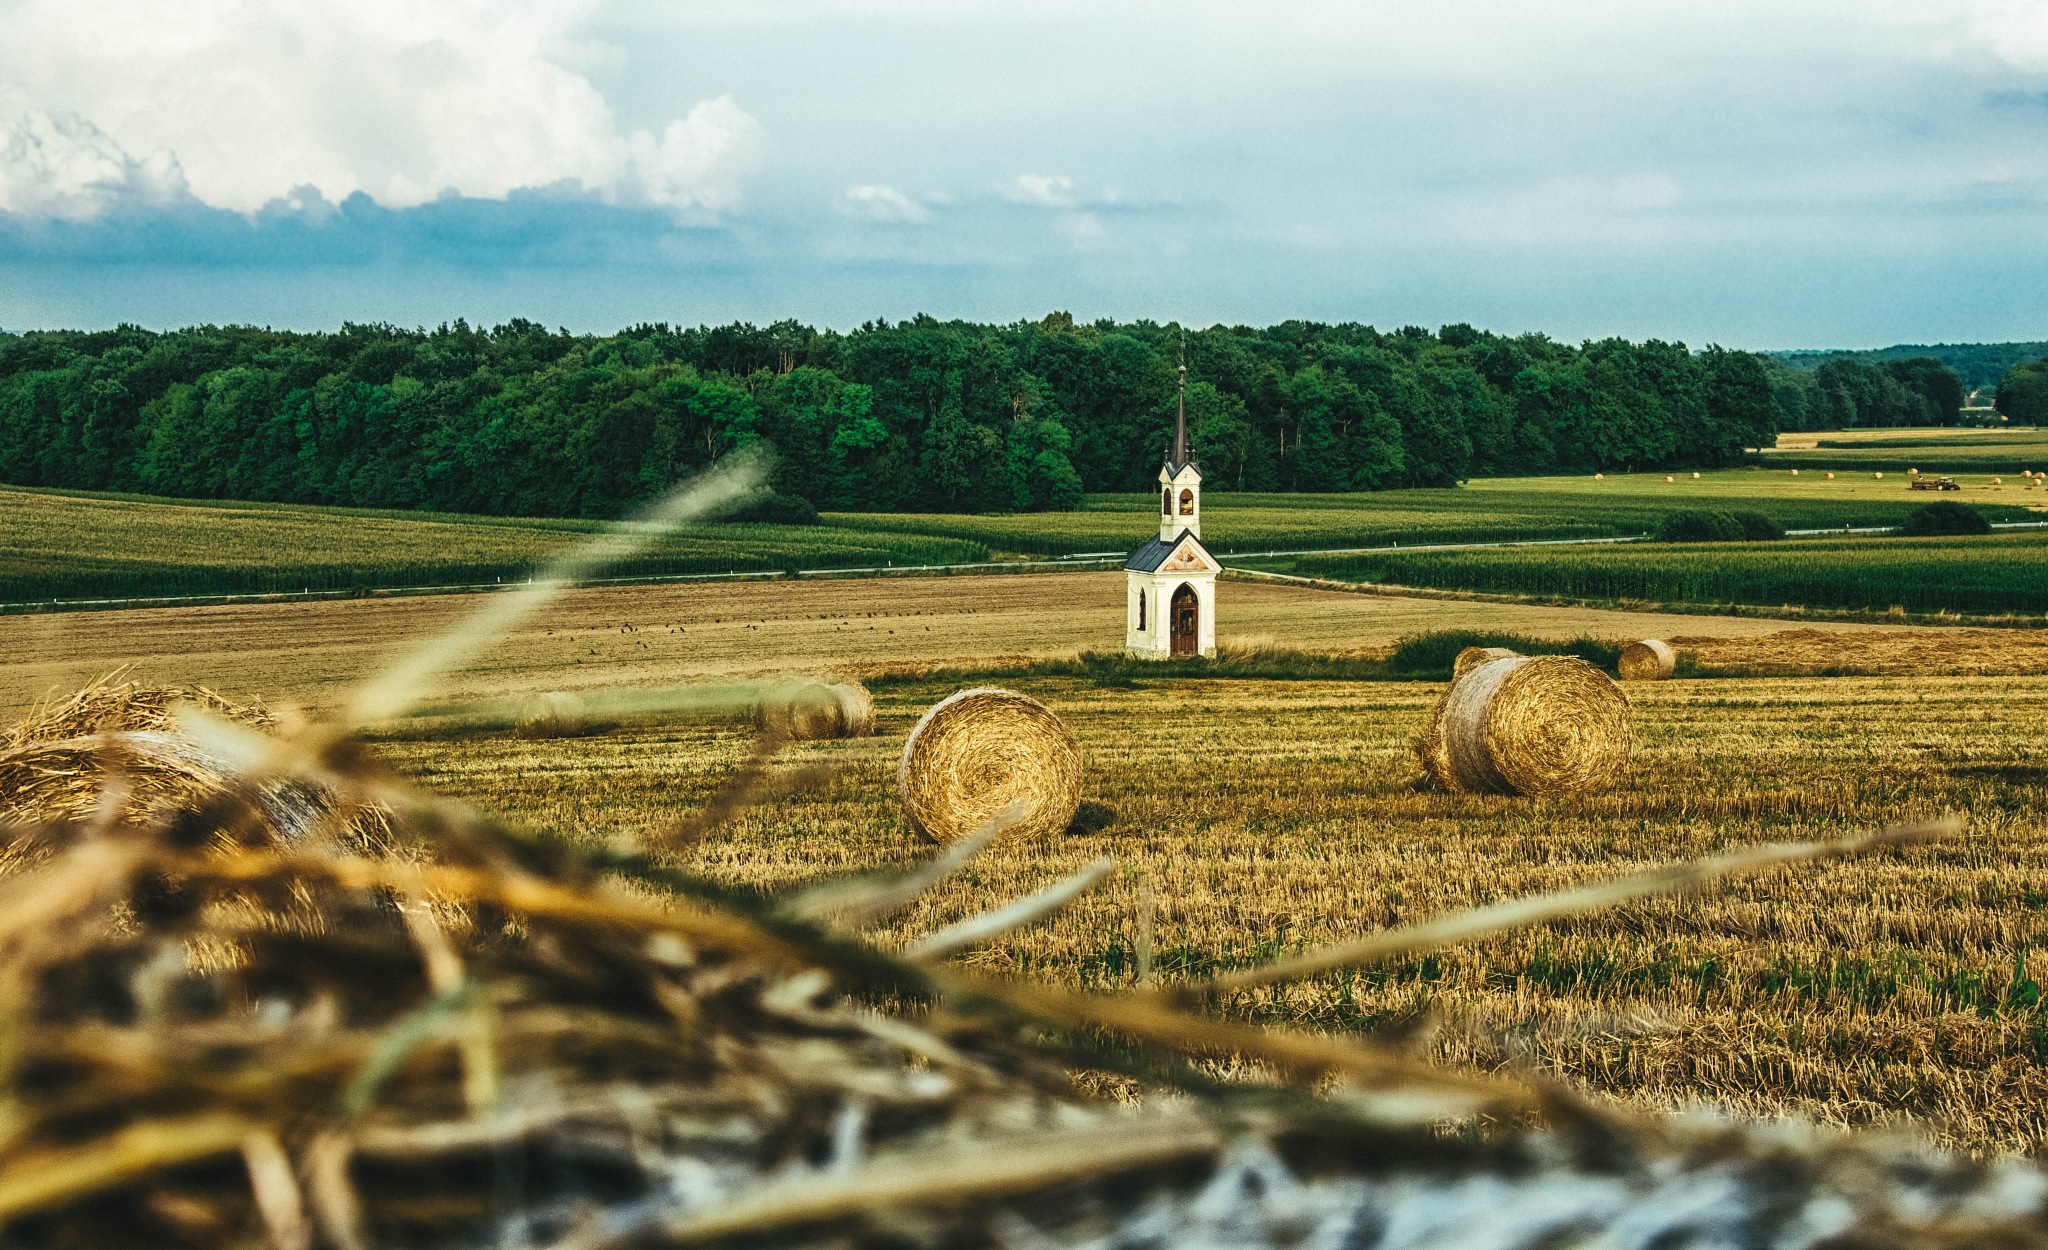 Country side  by Ksenija Vrbnjak